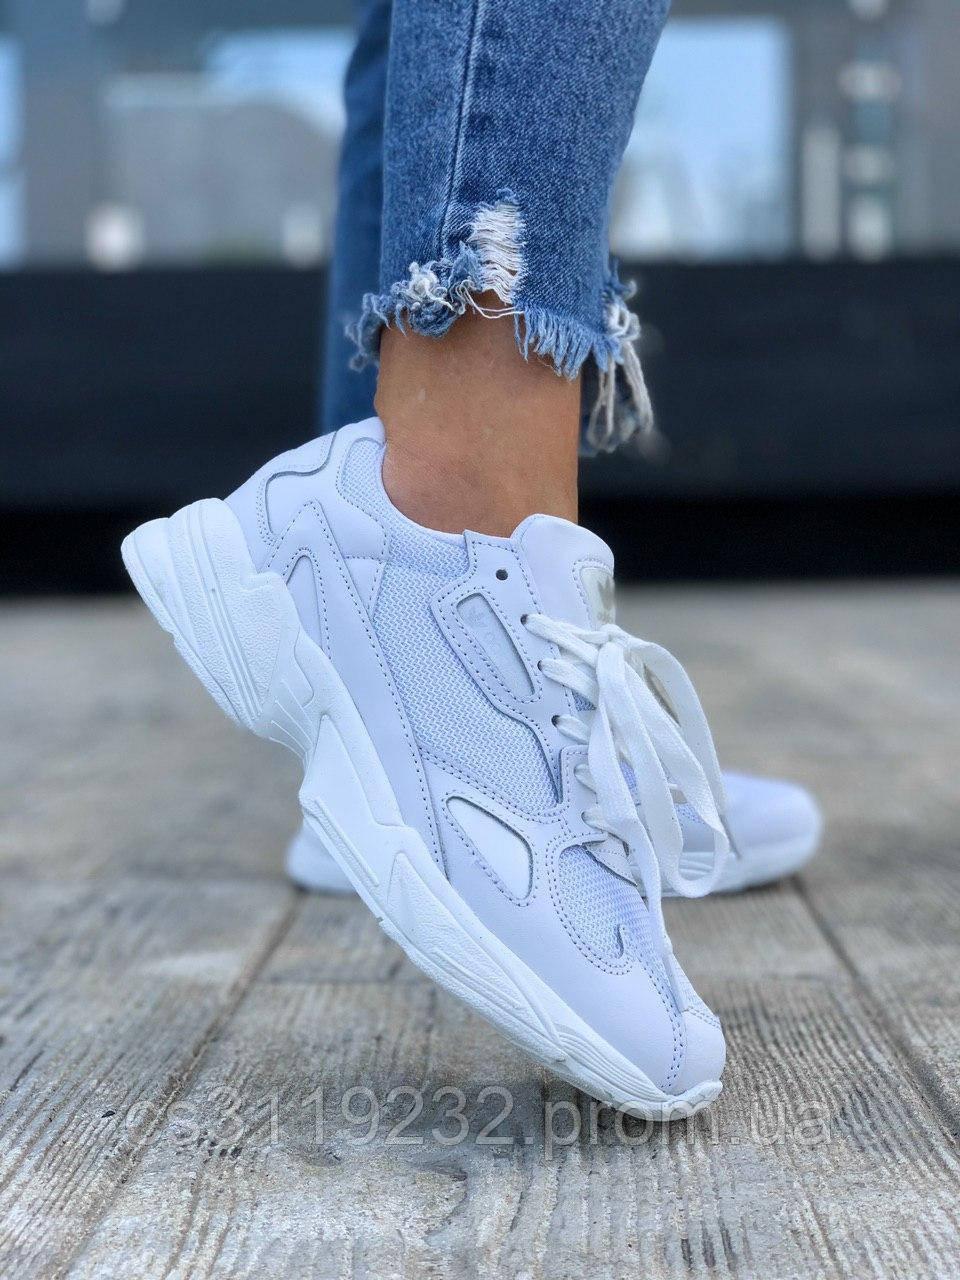 Женские кроссовки Adidas Falcon Full White (белые)